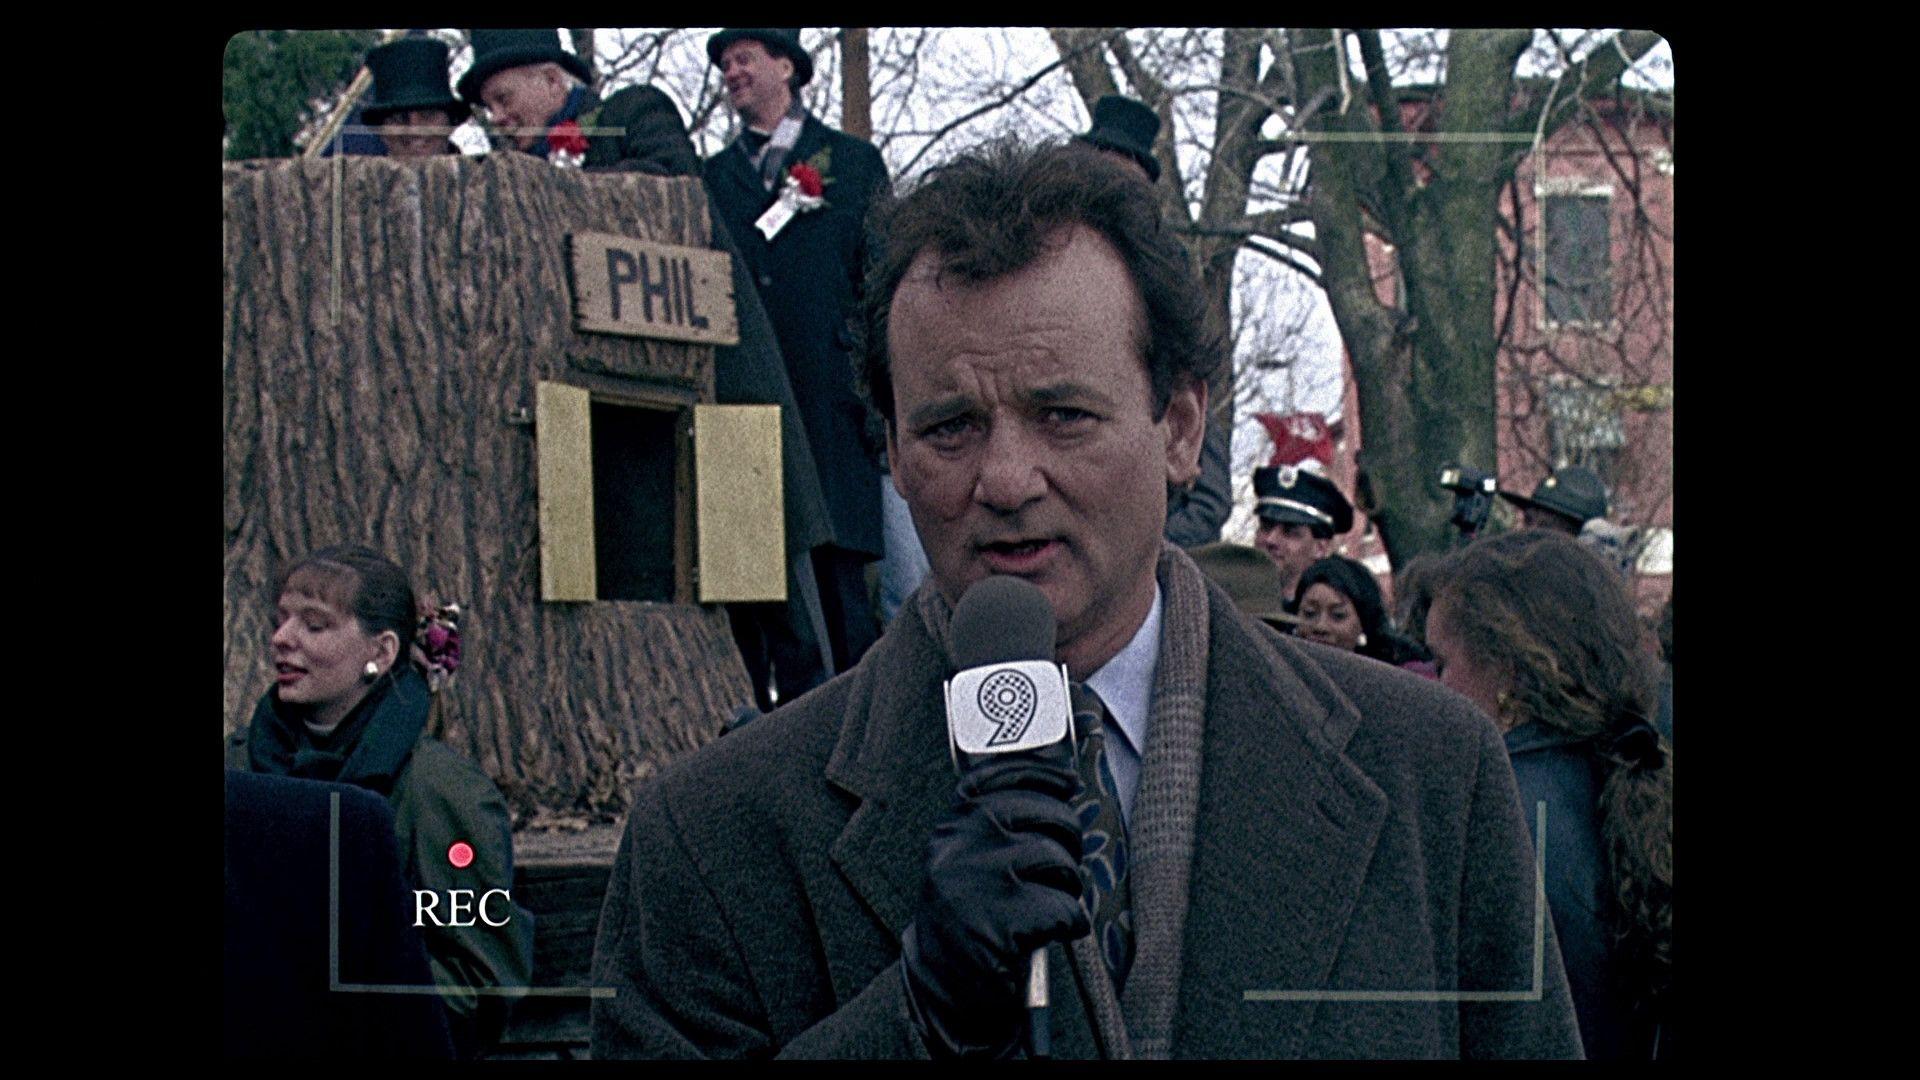 Groundhog Day Movie Quotes Espectros Marmotas Ycarcajadas  Phil Connors Music Tv And Movie